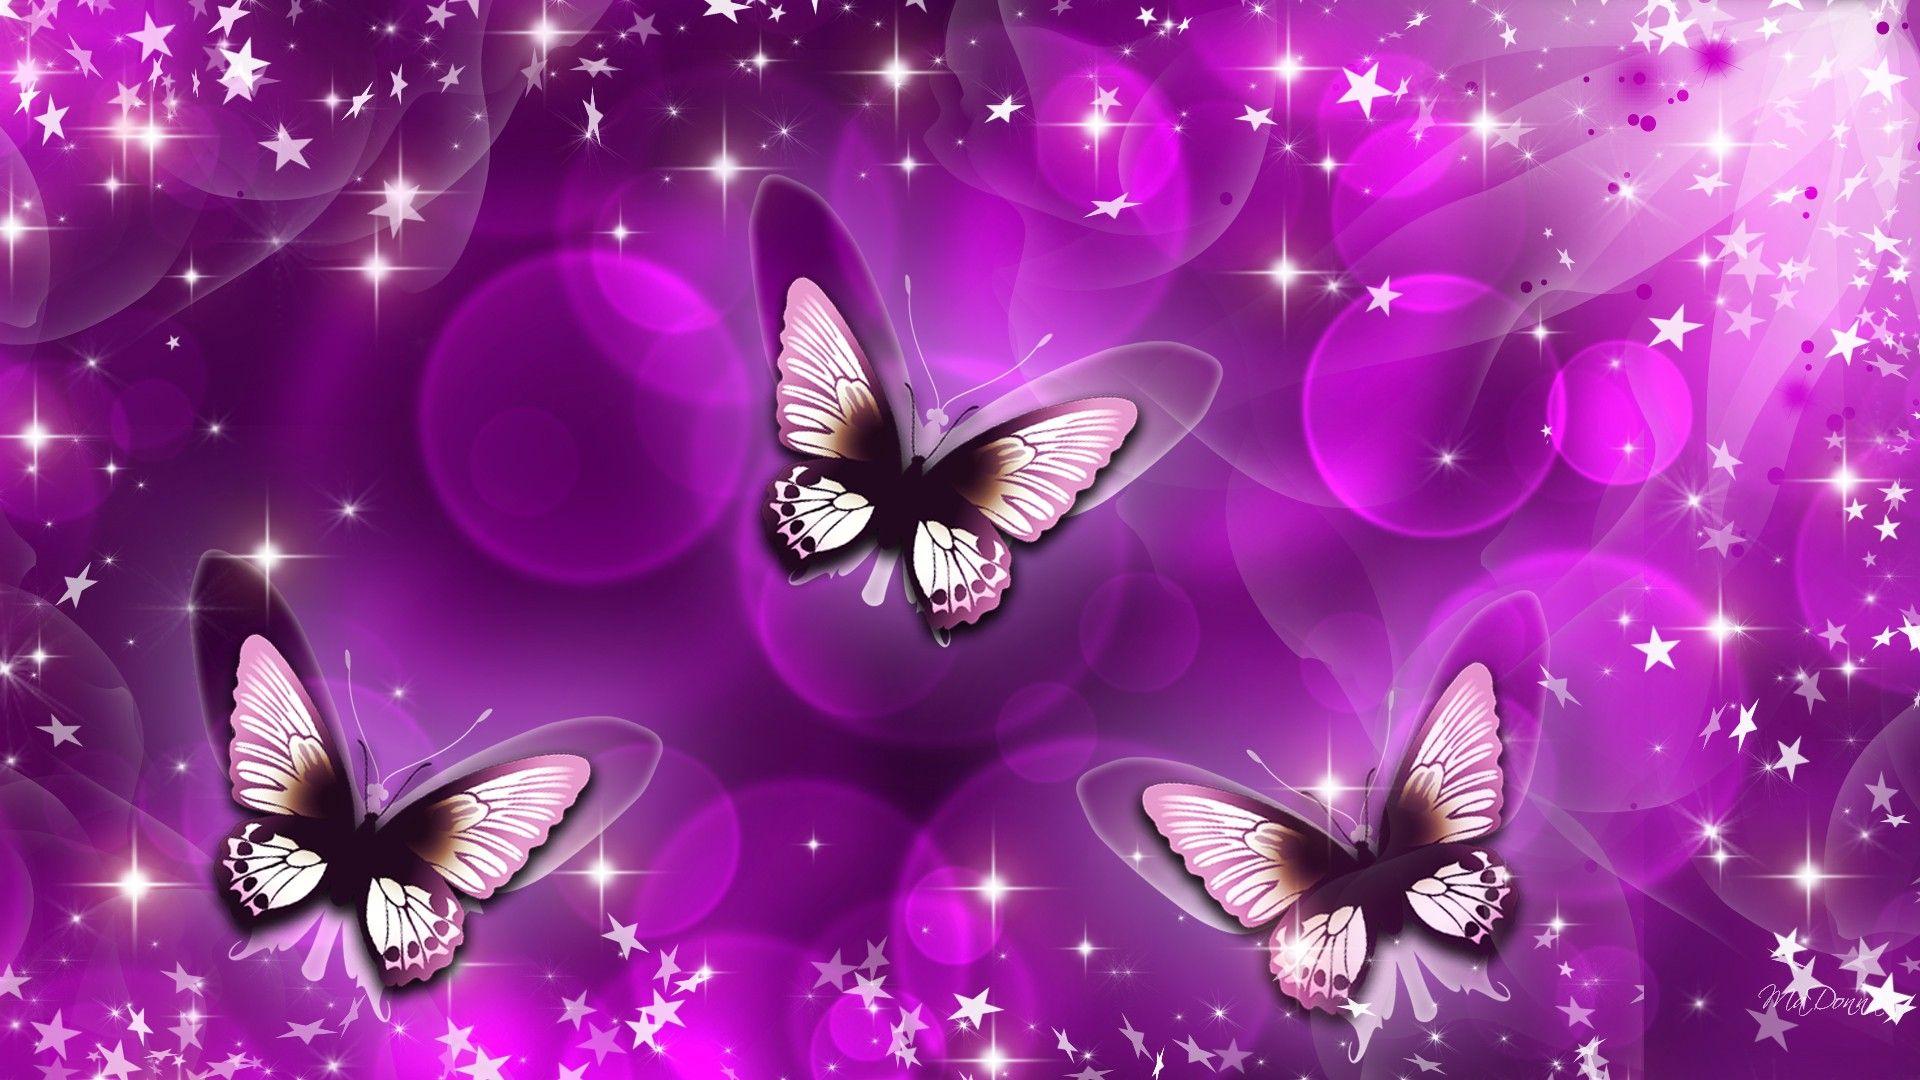 Purple Flower Wallpaper For Bedroom Butterfly Picture Wallpapers 8928 Wallpaper Risewall